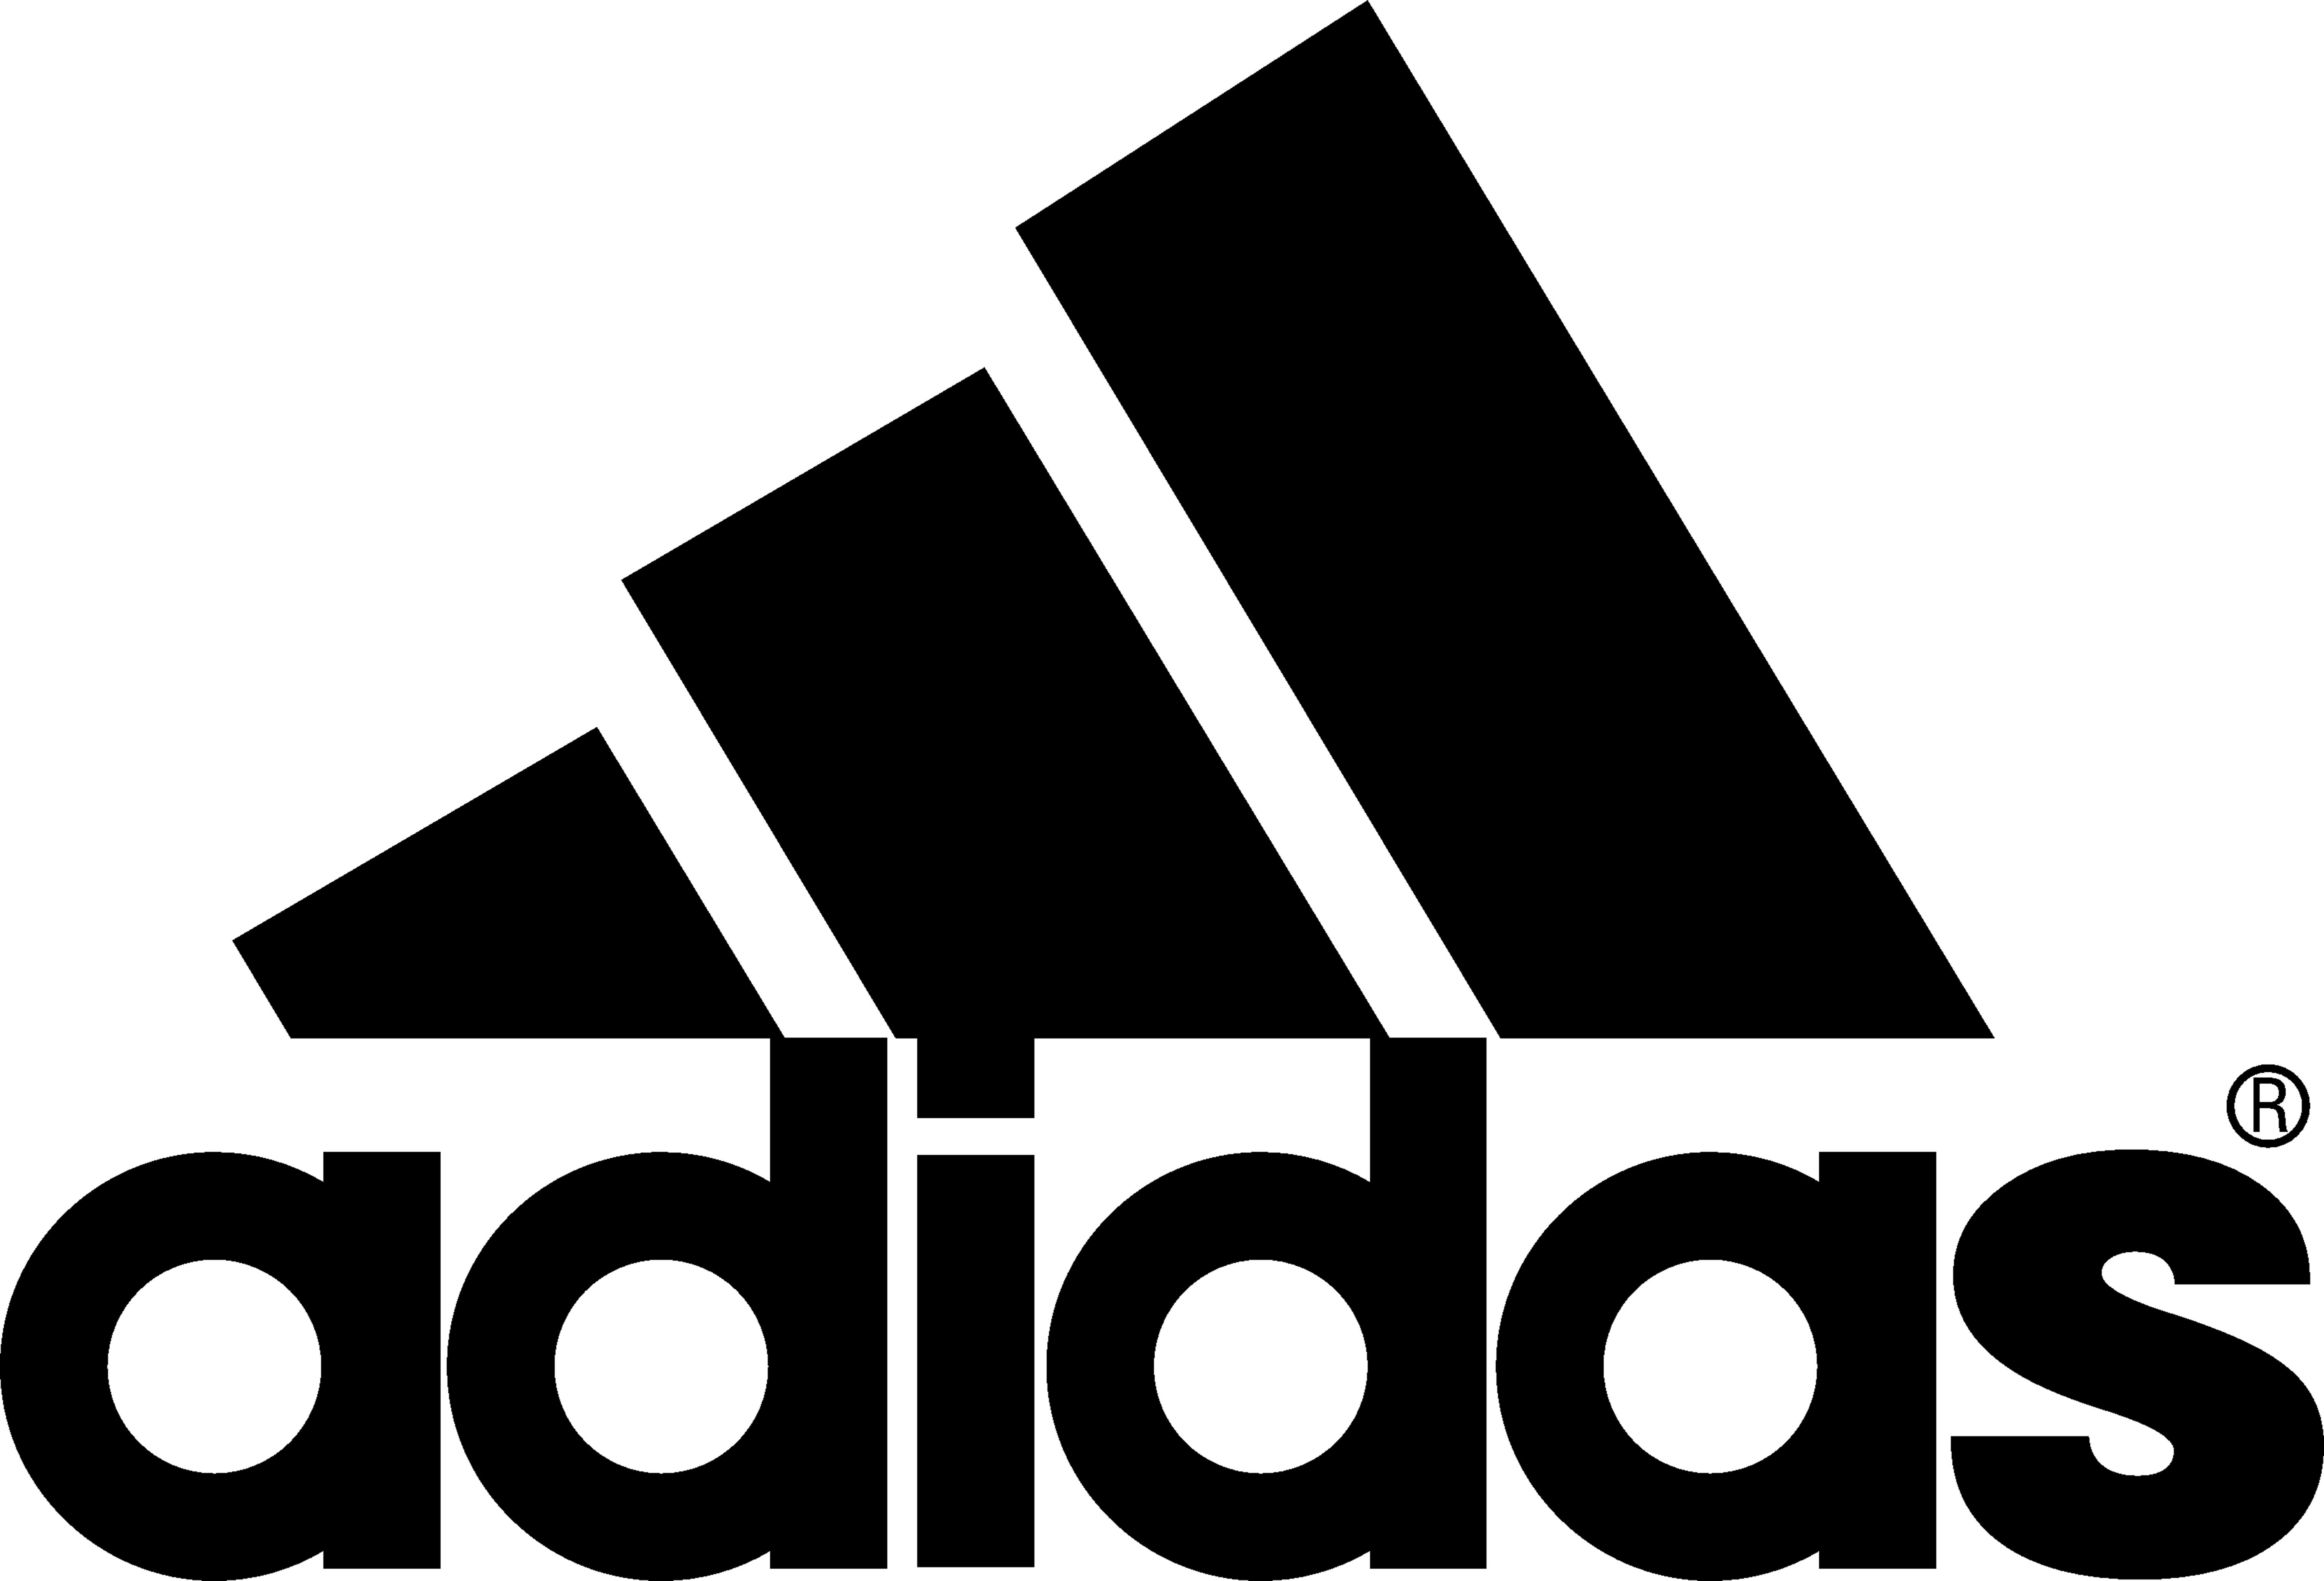 Adidas Logo Wallpaper 2017 - WallpaperSafari 3d963ca823